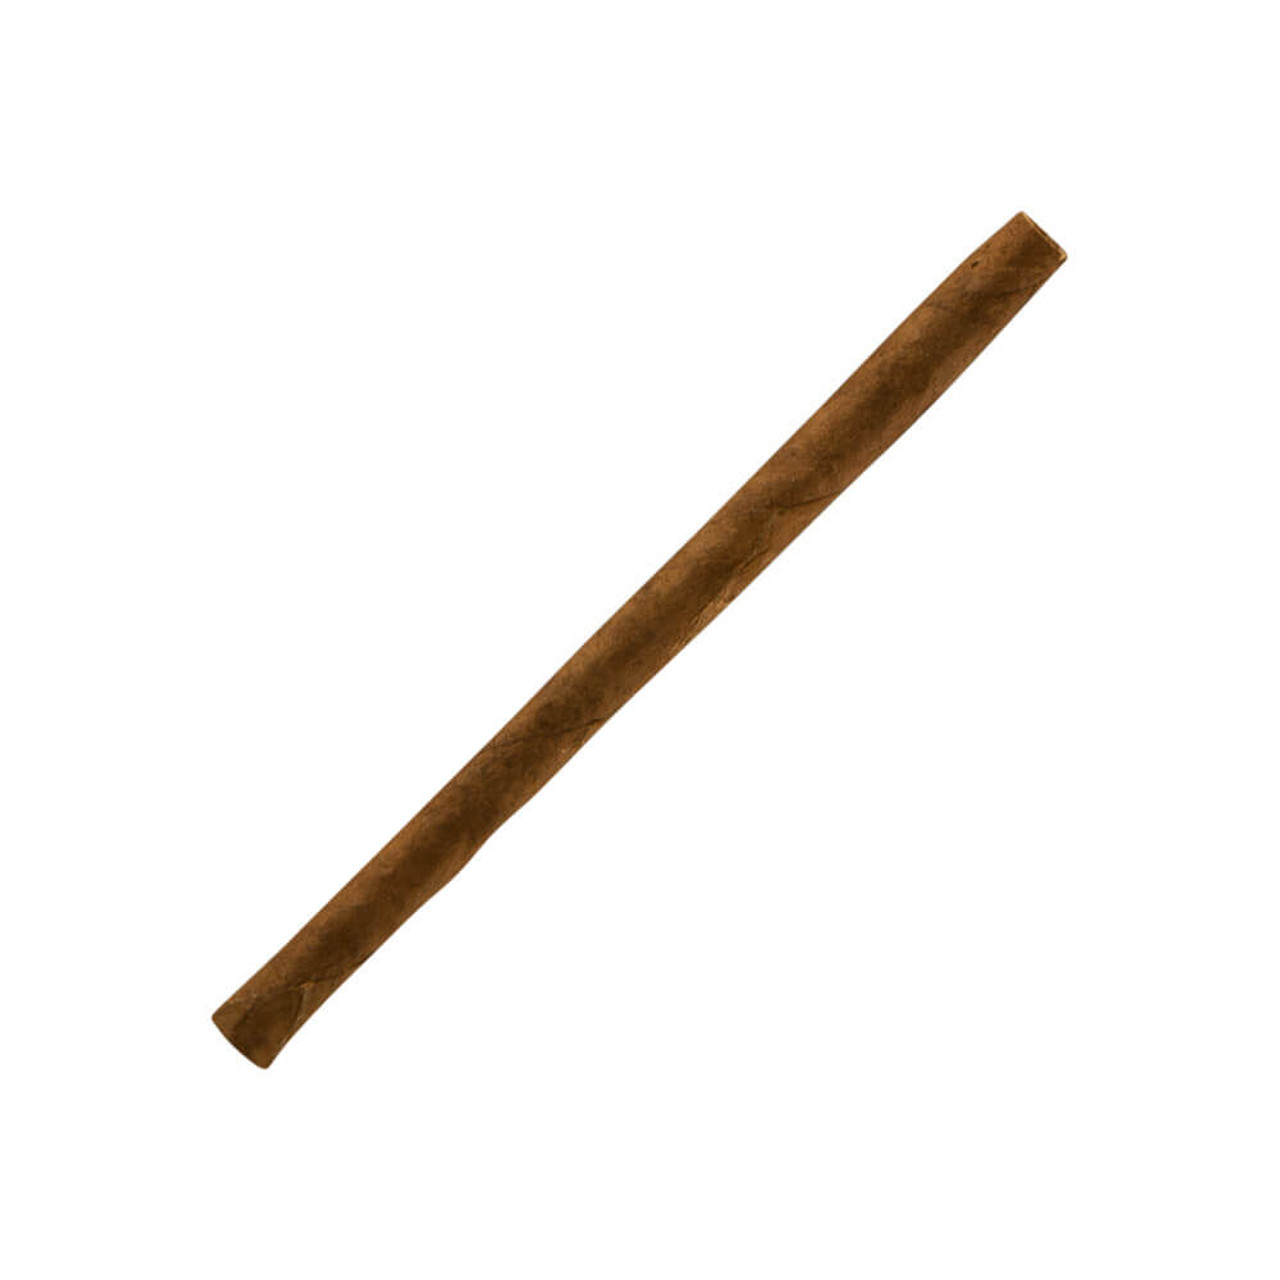 Dutch Delites Swiss Chicos Lt. Java Cigars - 5 x 30 (Box of 50)